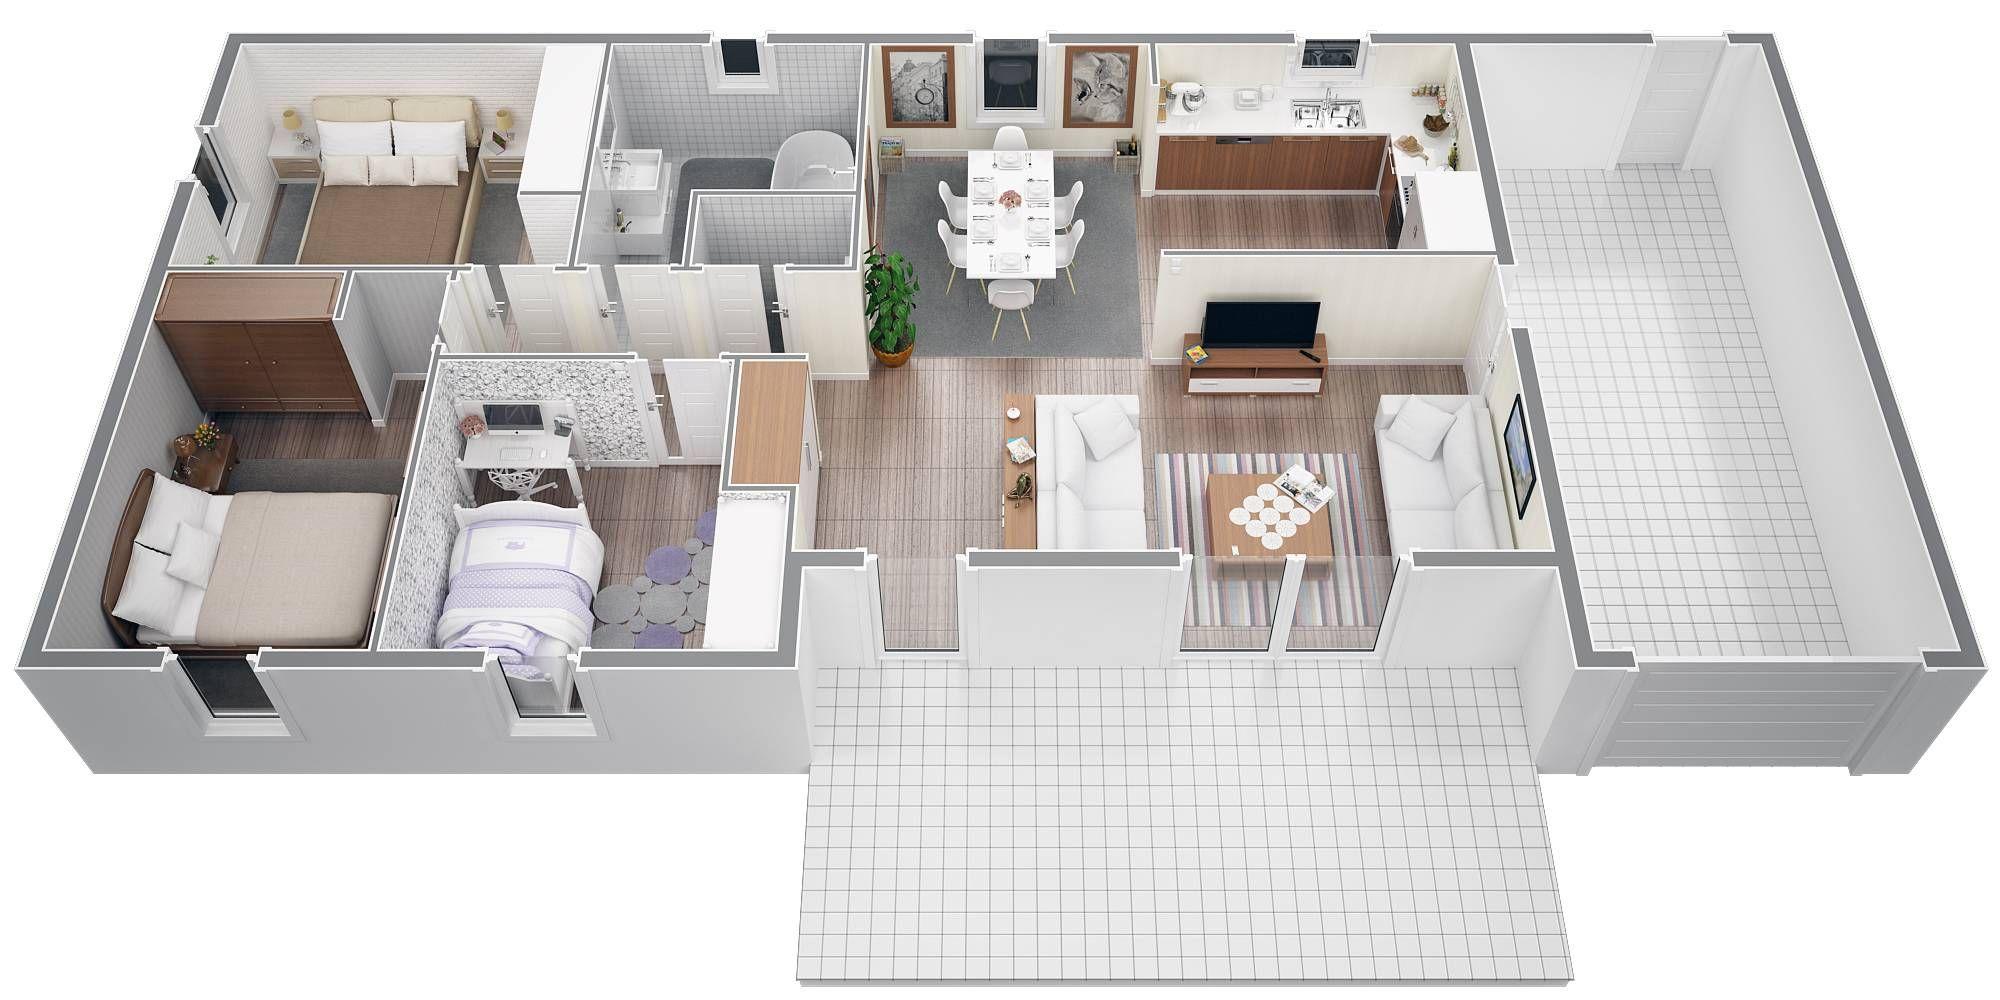 Plan Maison Plain Pied 80m2 Plan Maison Plan Maison 90m2 Plan Maison Plain Pied